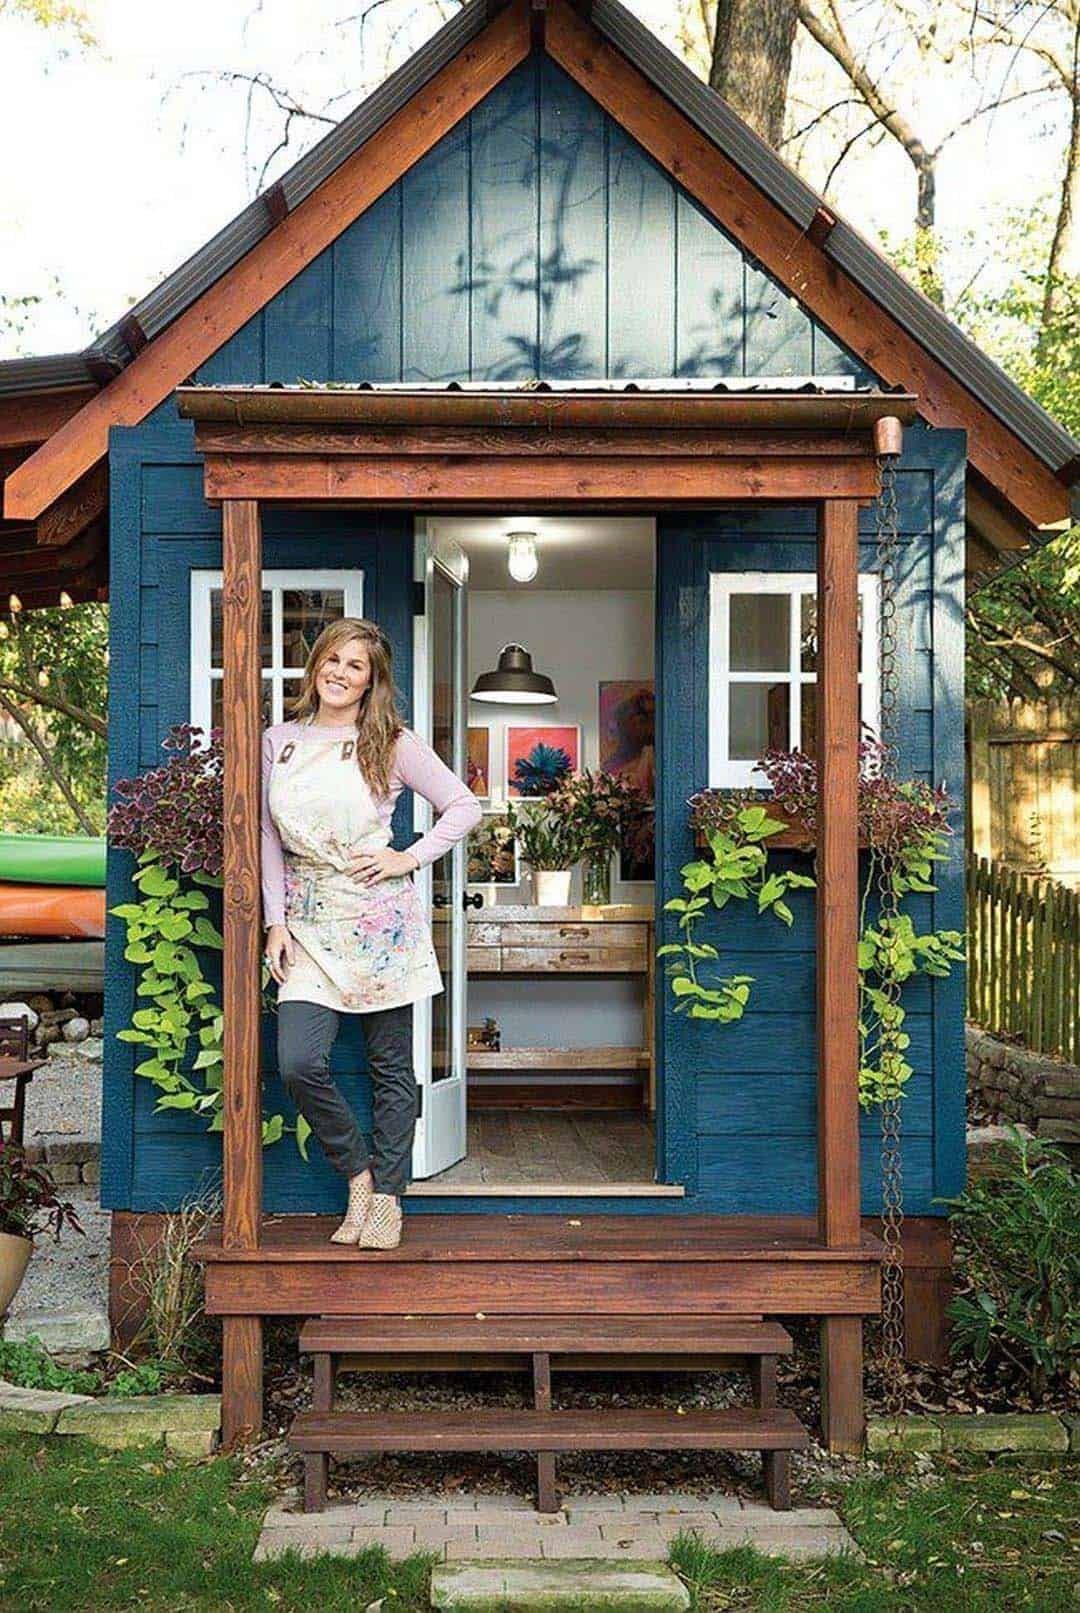 30 Wonderfully Inspiring She Shed Ideas To Adorn Your Backyard Shed Decor Shed Design Backyard Storage